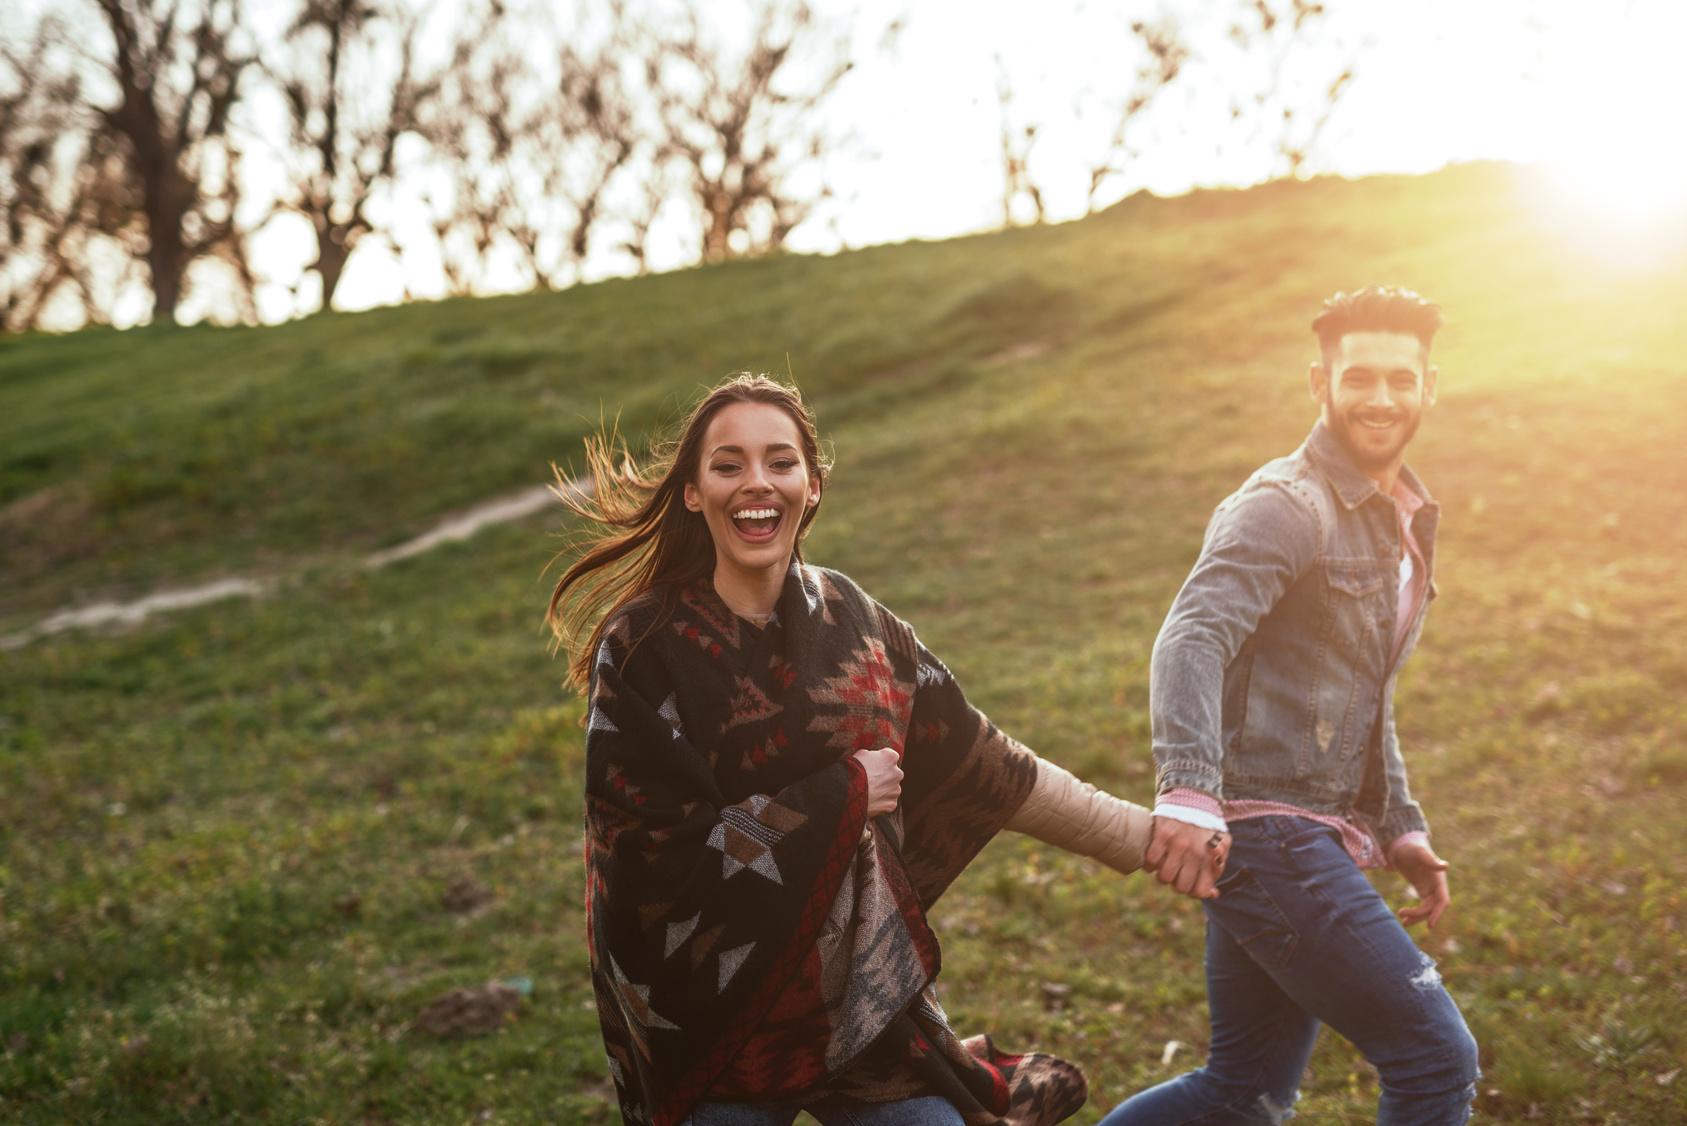 Beziehungskrise? Probleme In Der Partnerschaft Erkennen, Beziehungskiller Vermeiden.